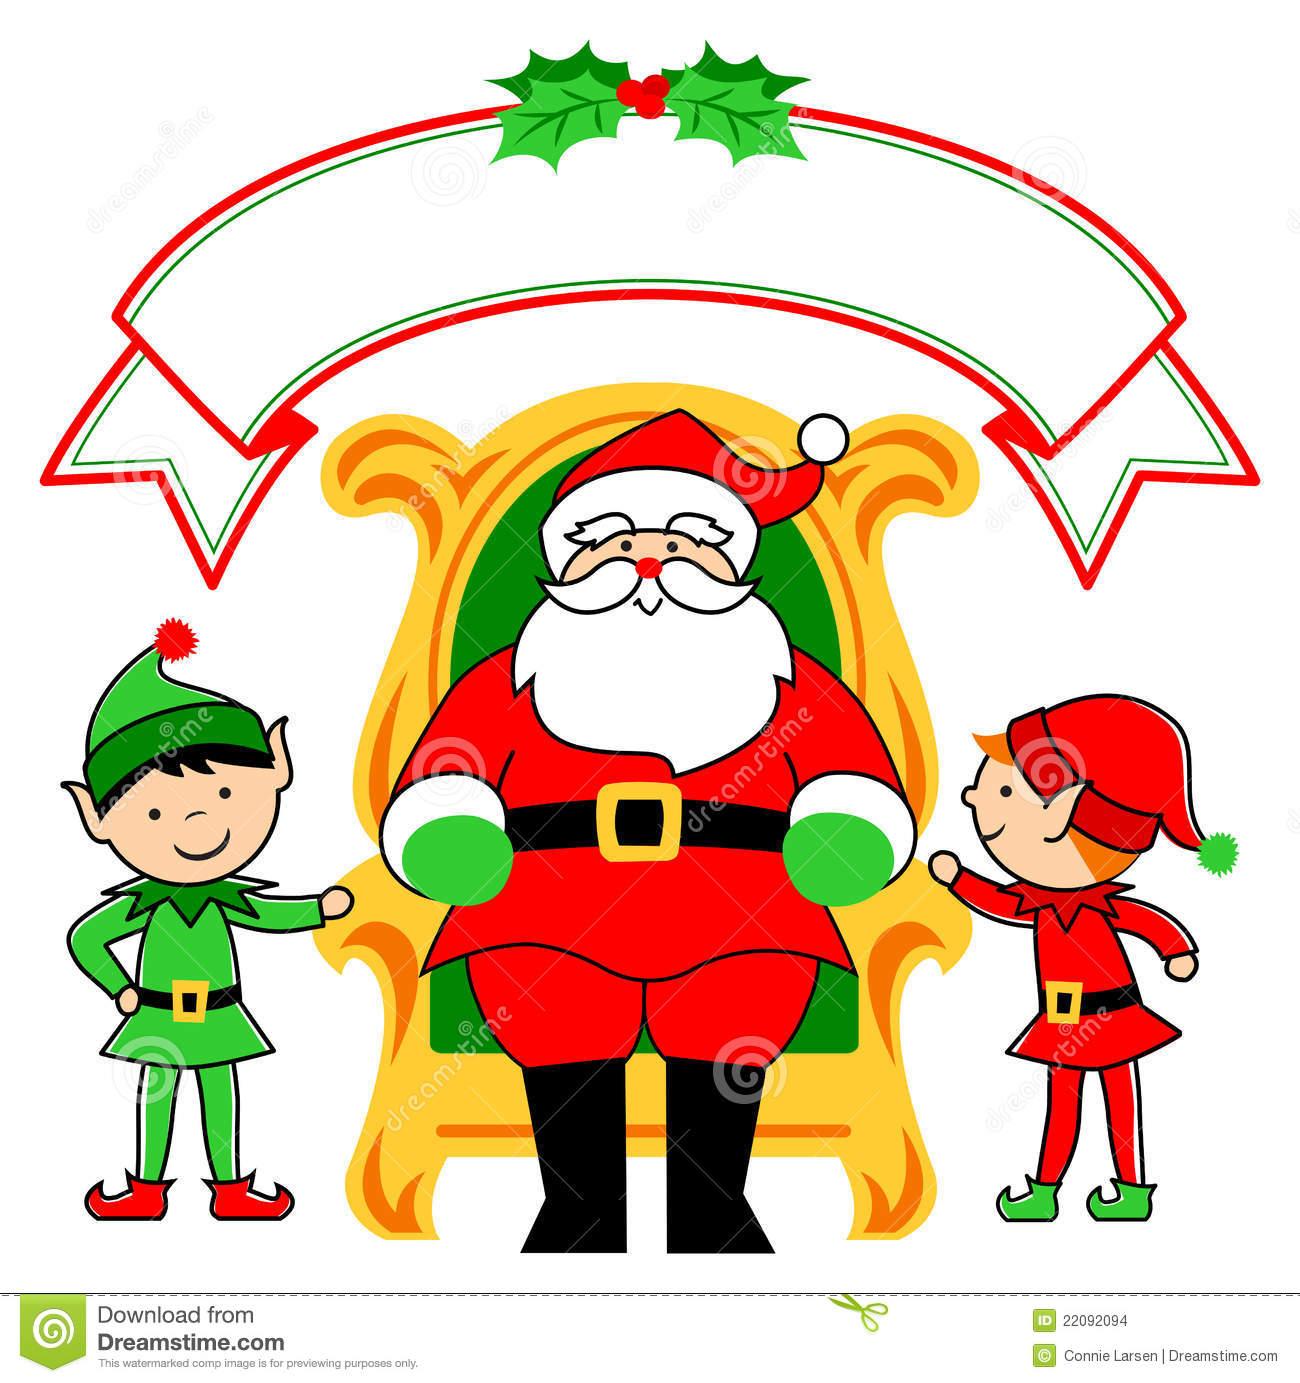 Santa and elves clipart svg transparent library Santa and elves clipart 5 » Clipart Station svg transparent library